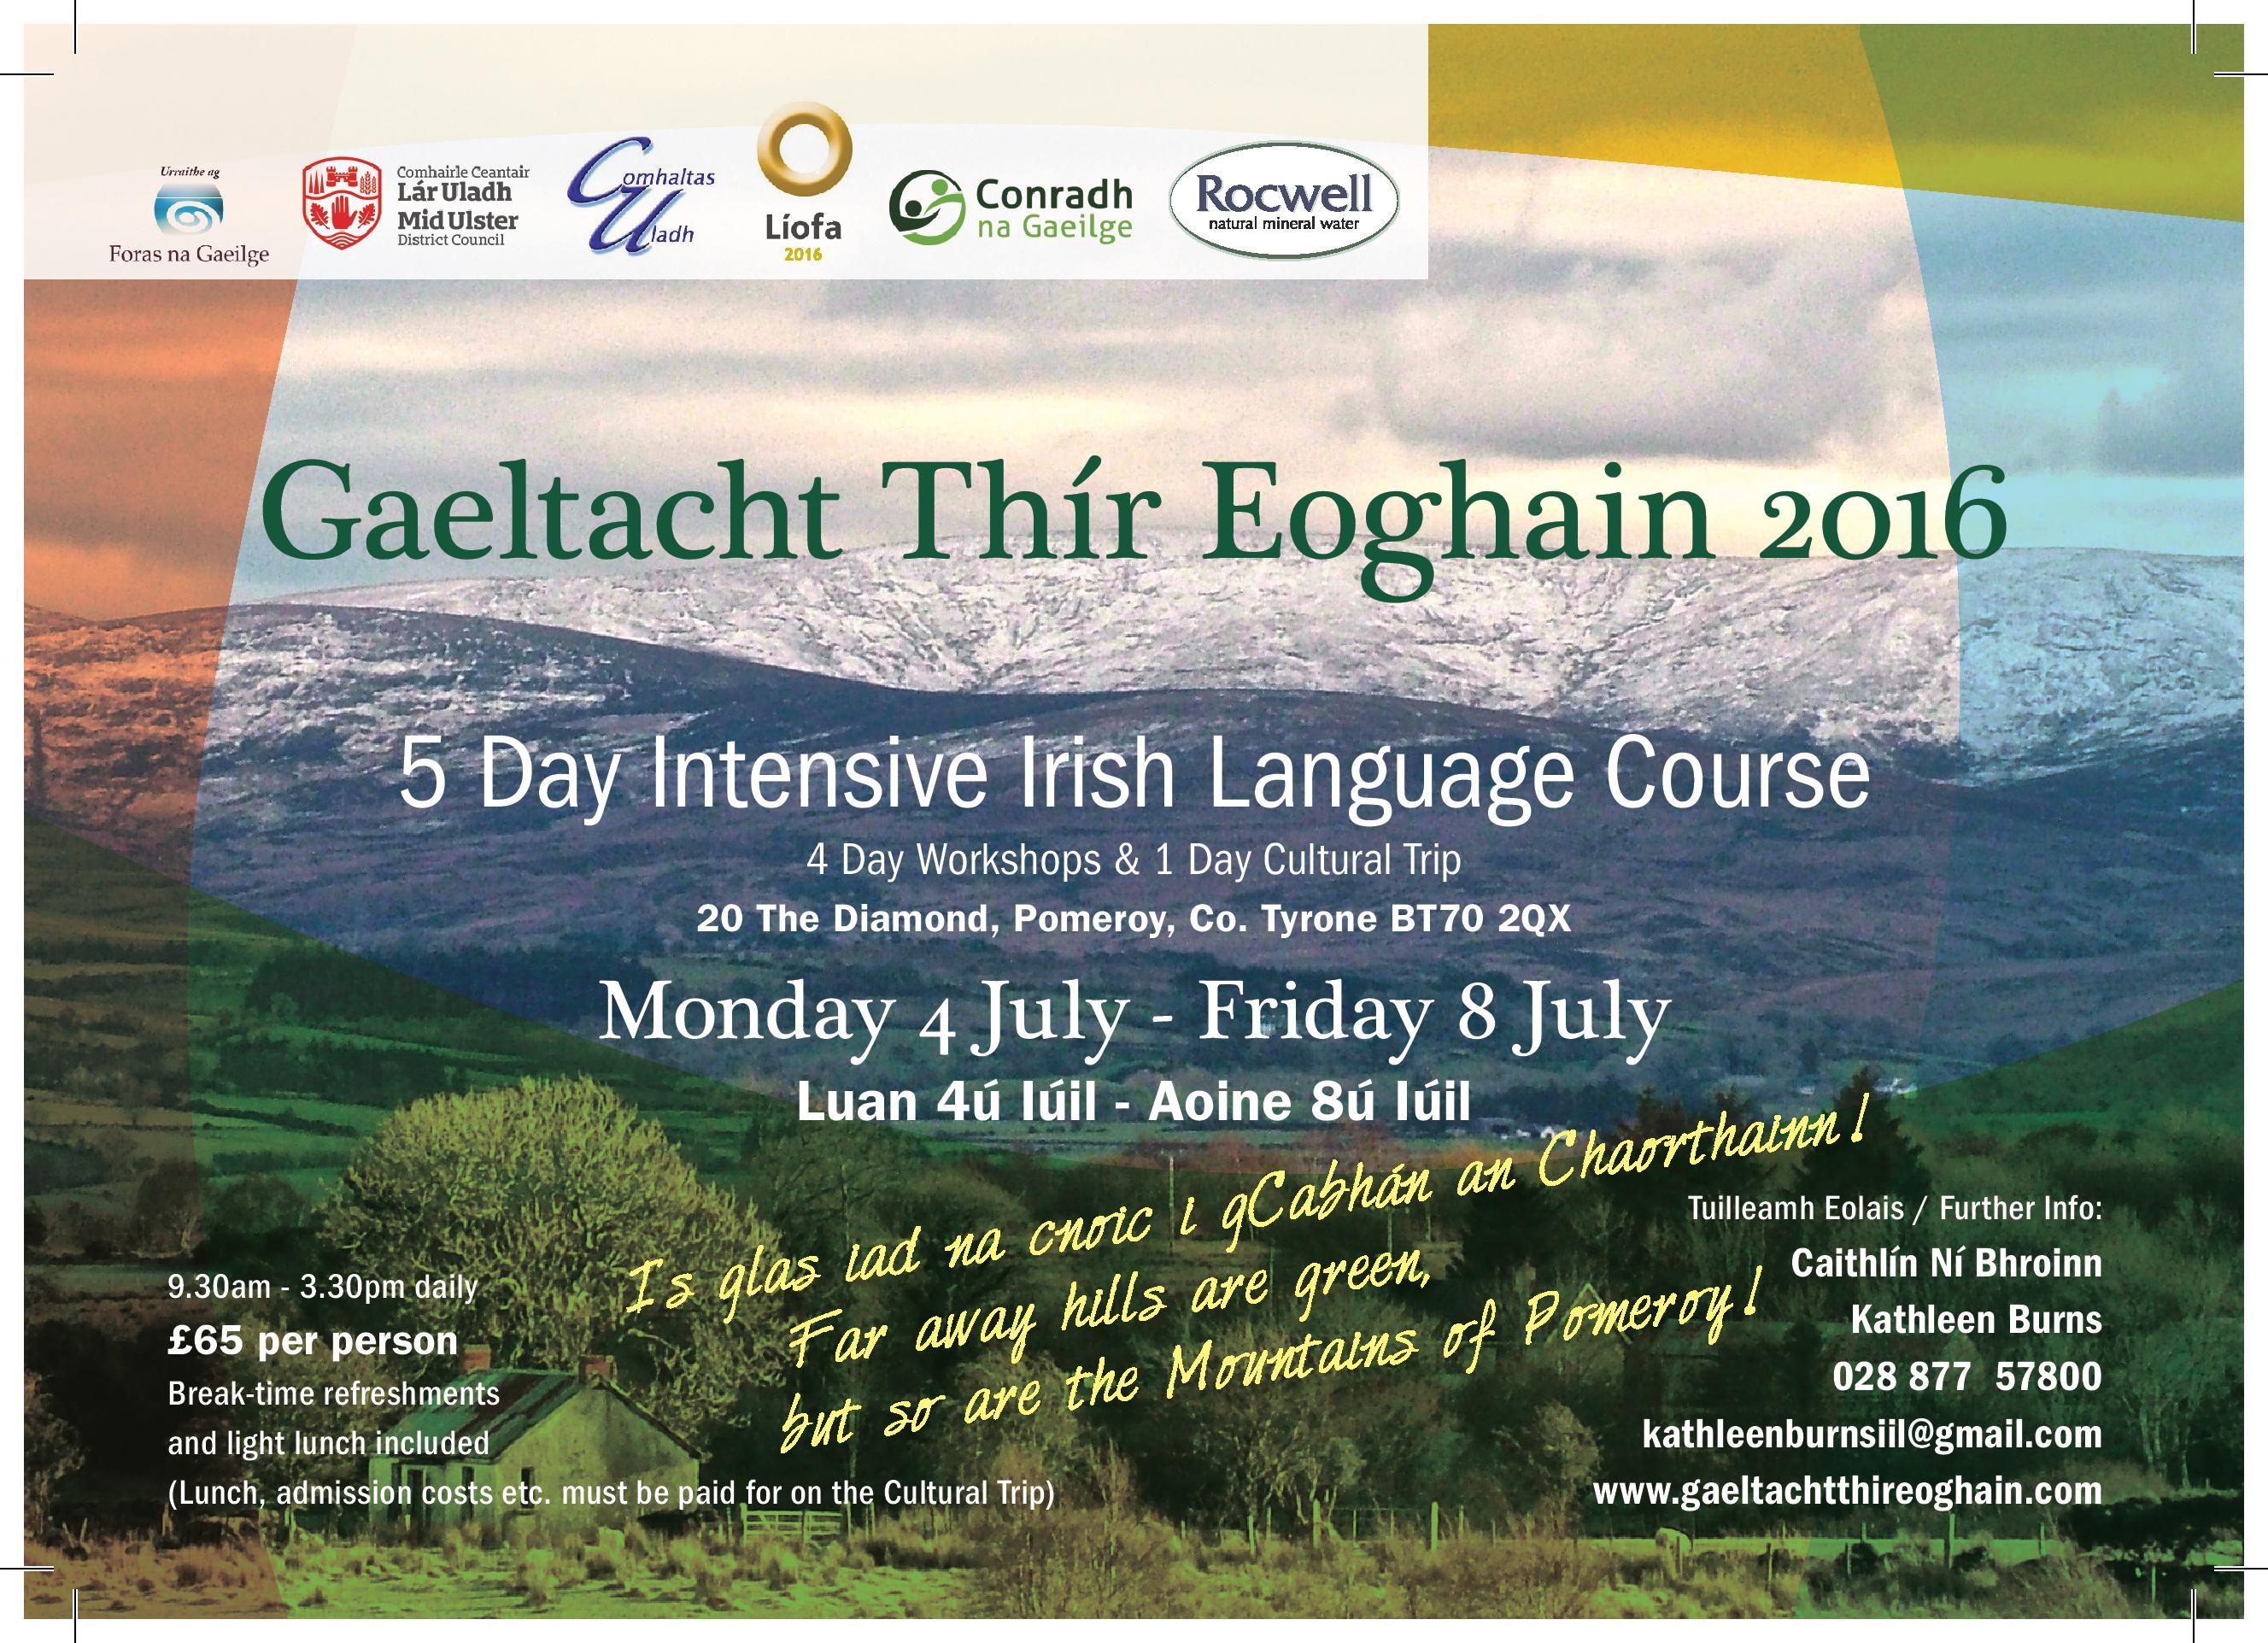 Gaeltacht Thir Eoghain 2016